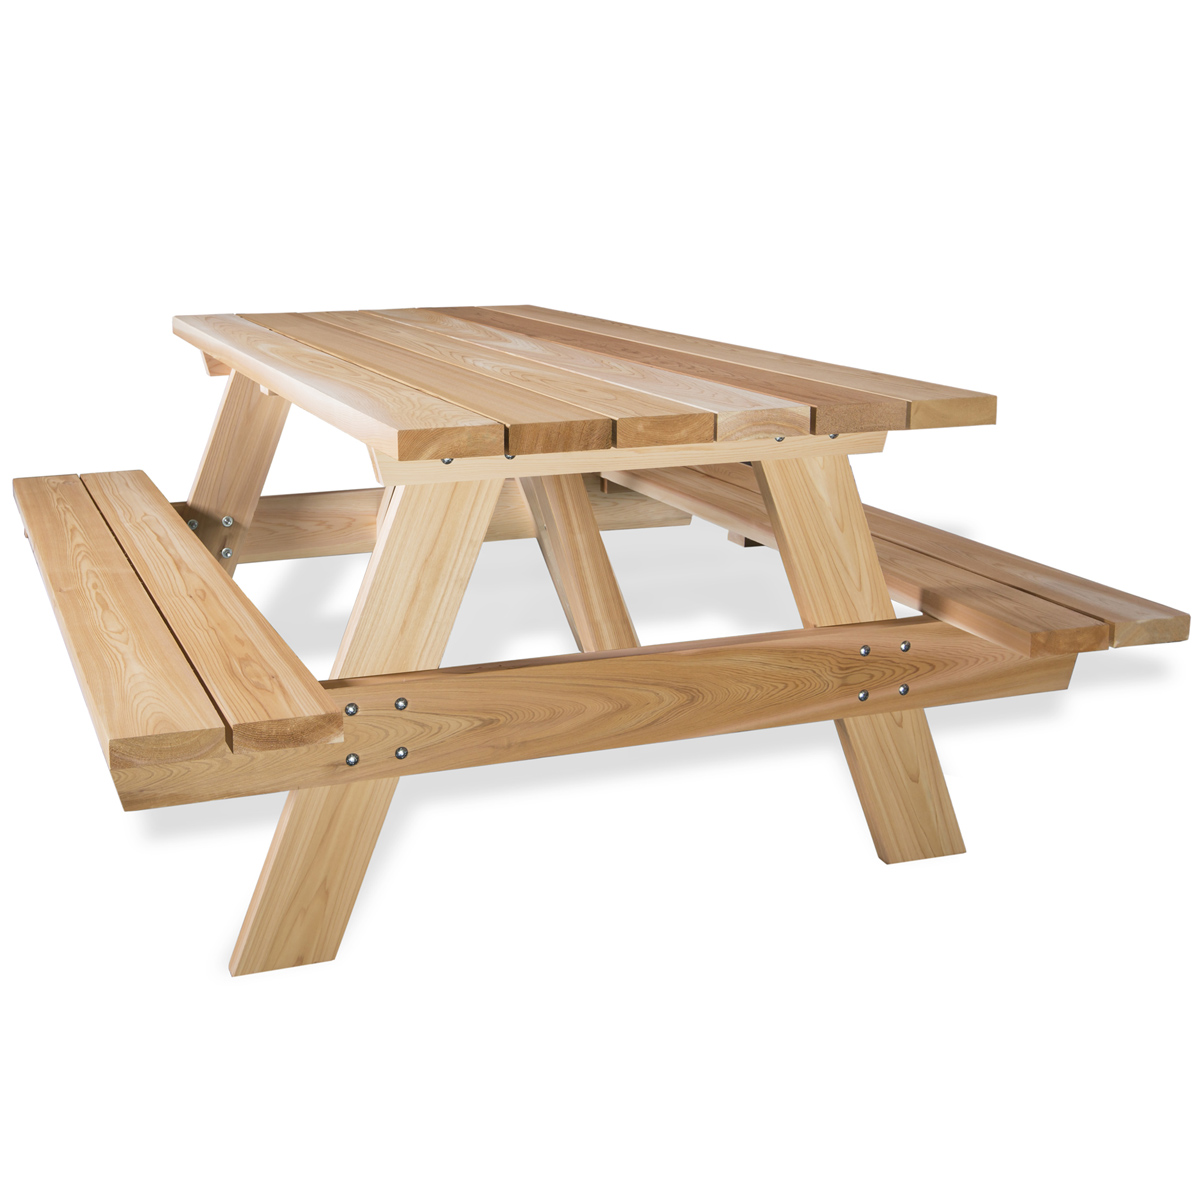 Swell Wooden Picnic Table Kits By All Things Cedar Patio Tables Creativecarmelina Interior Chair Design Creativecarmelinacom